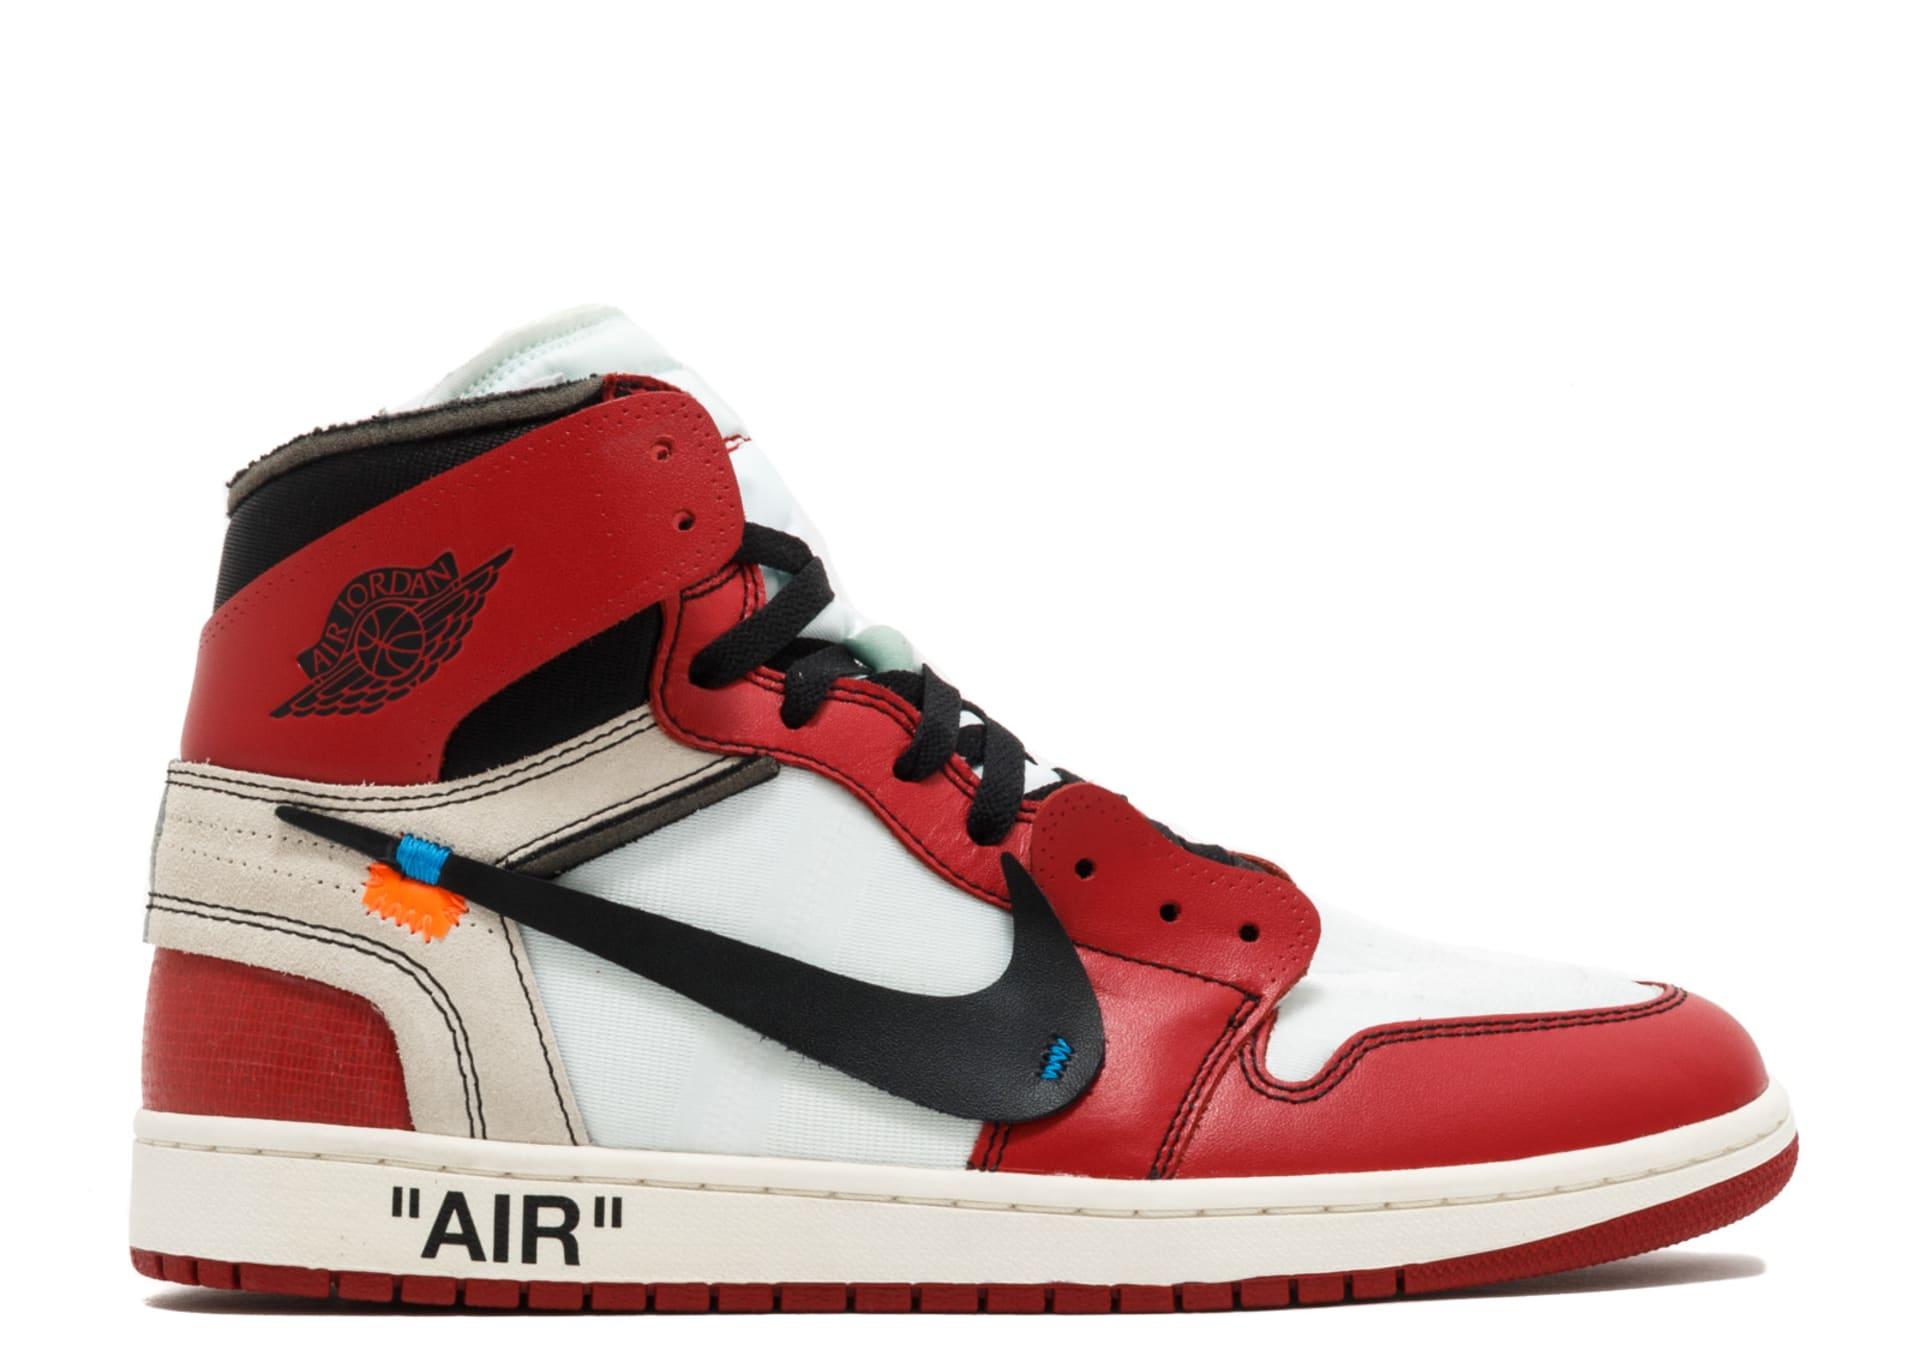 off-white-air-jordan-1